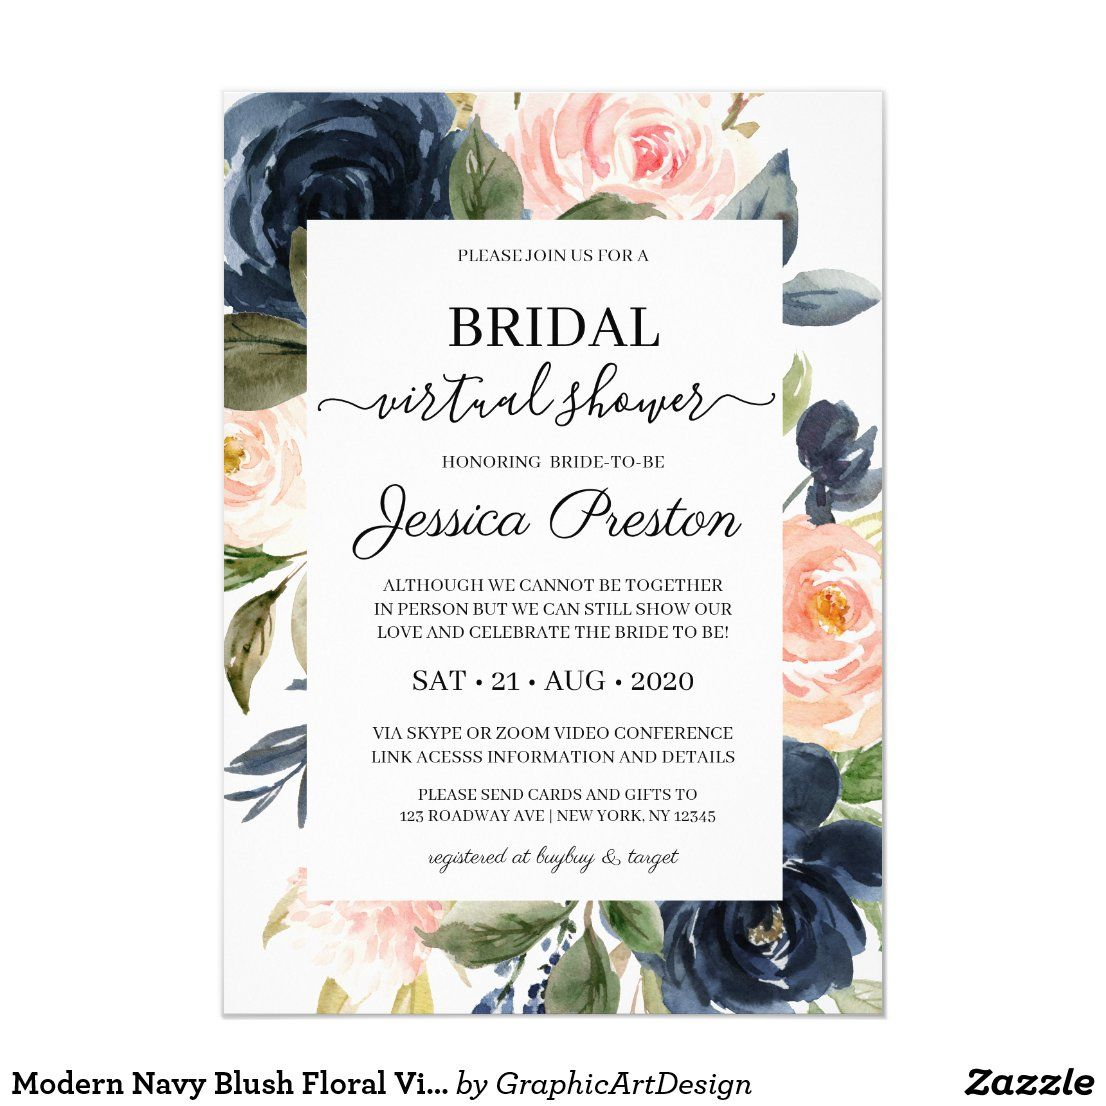 Modern Navy Blush Floral Virtual Bridal Shower Invitation Zazzle Com In 2020 Bridal Shower Invitations Bridal Shower Wedding Announcements Invitations